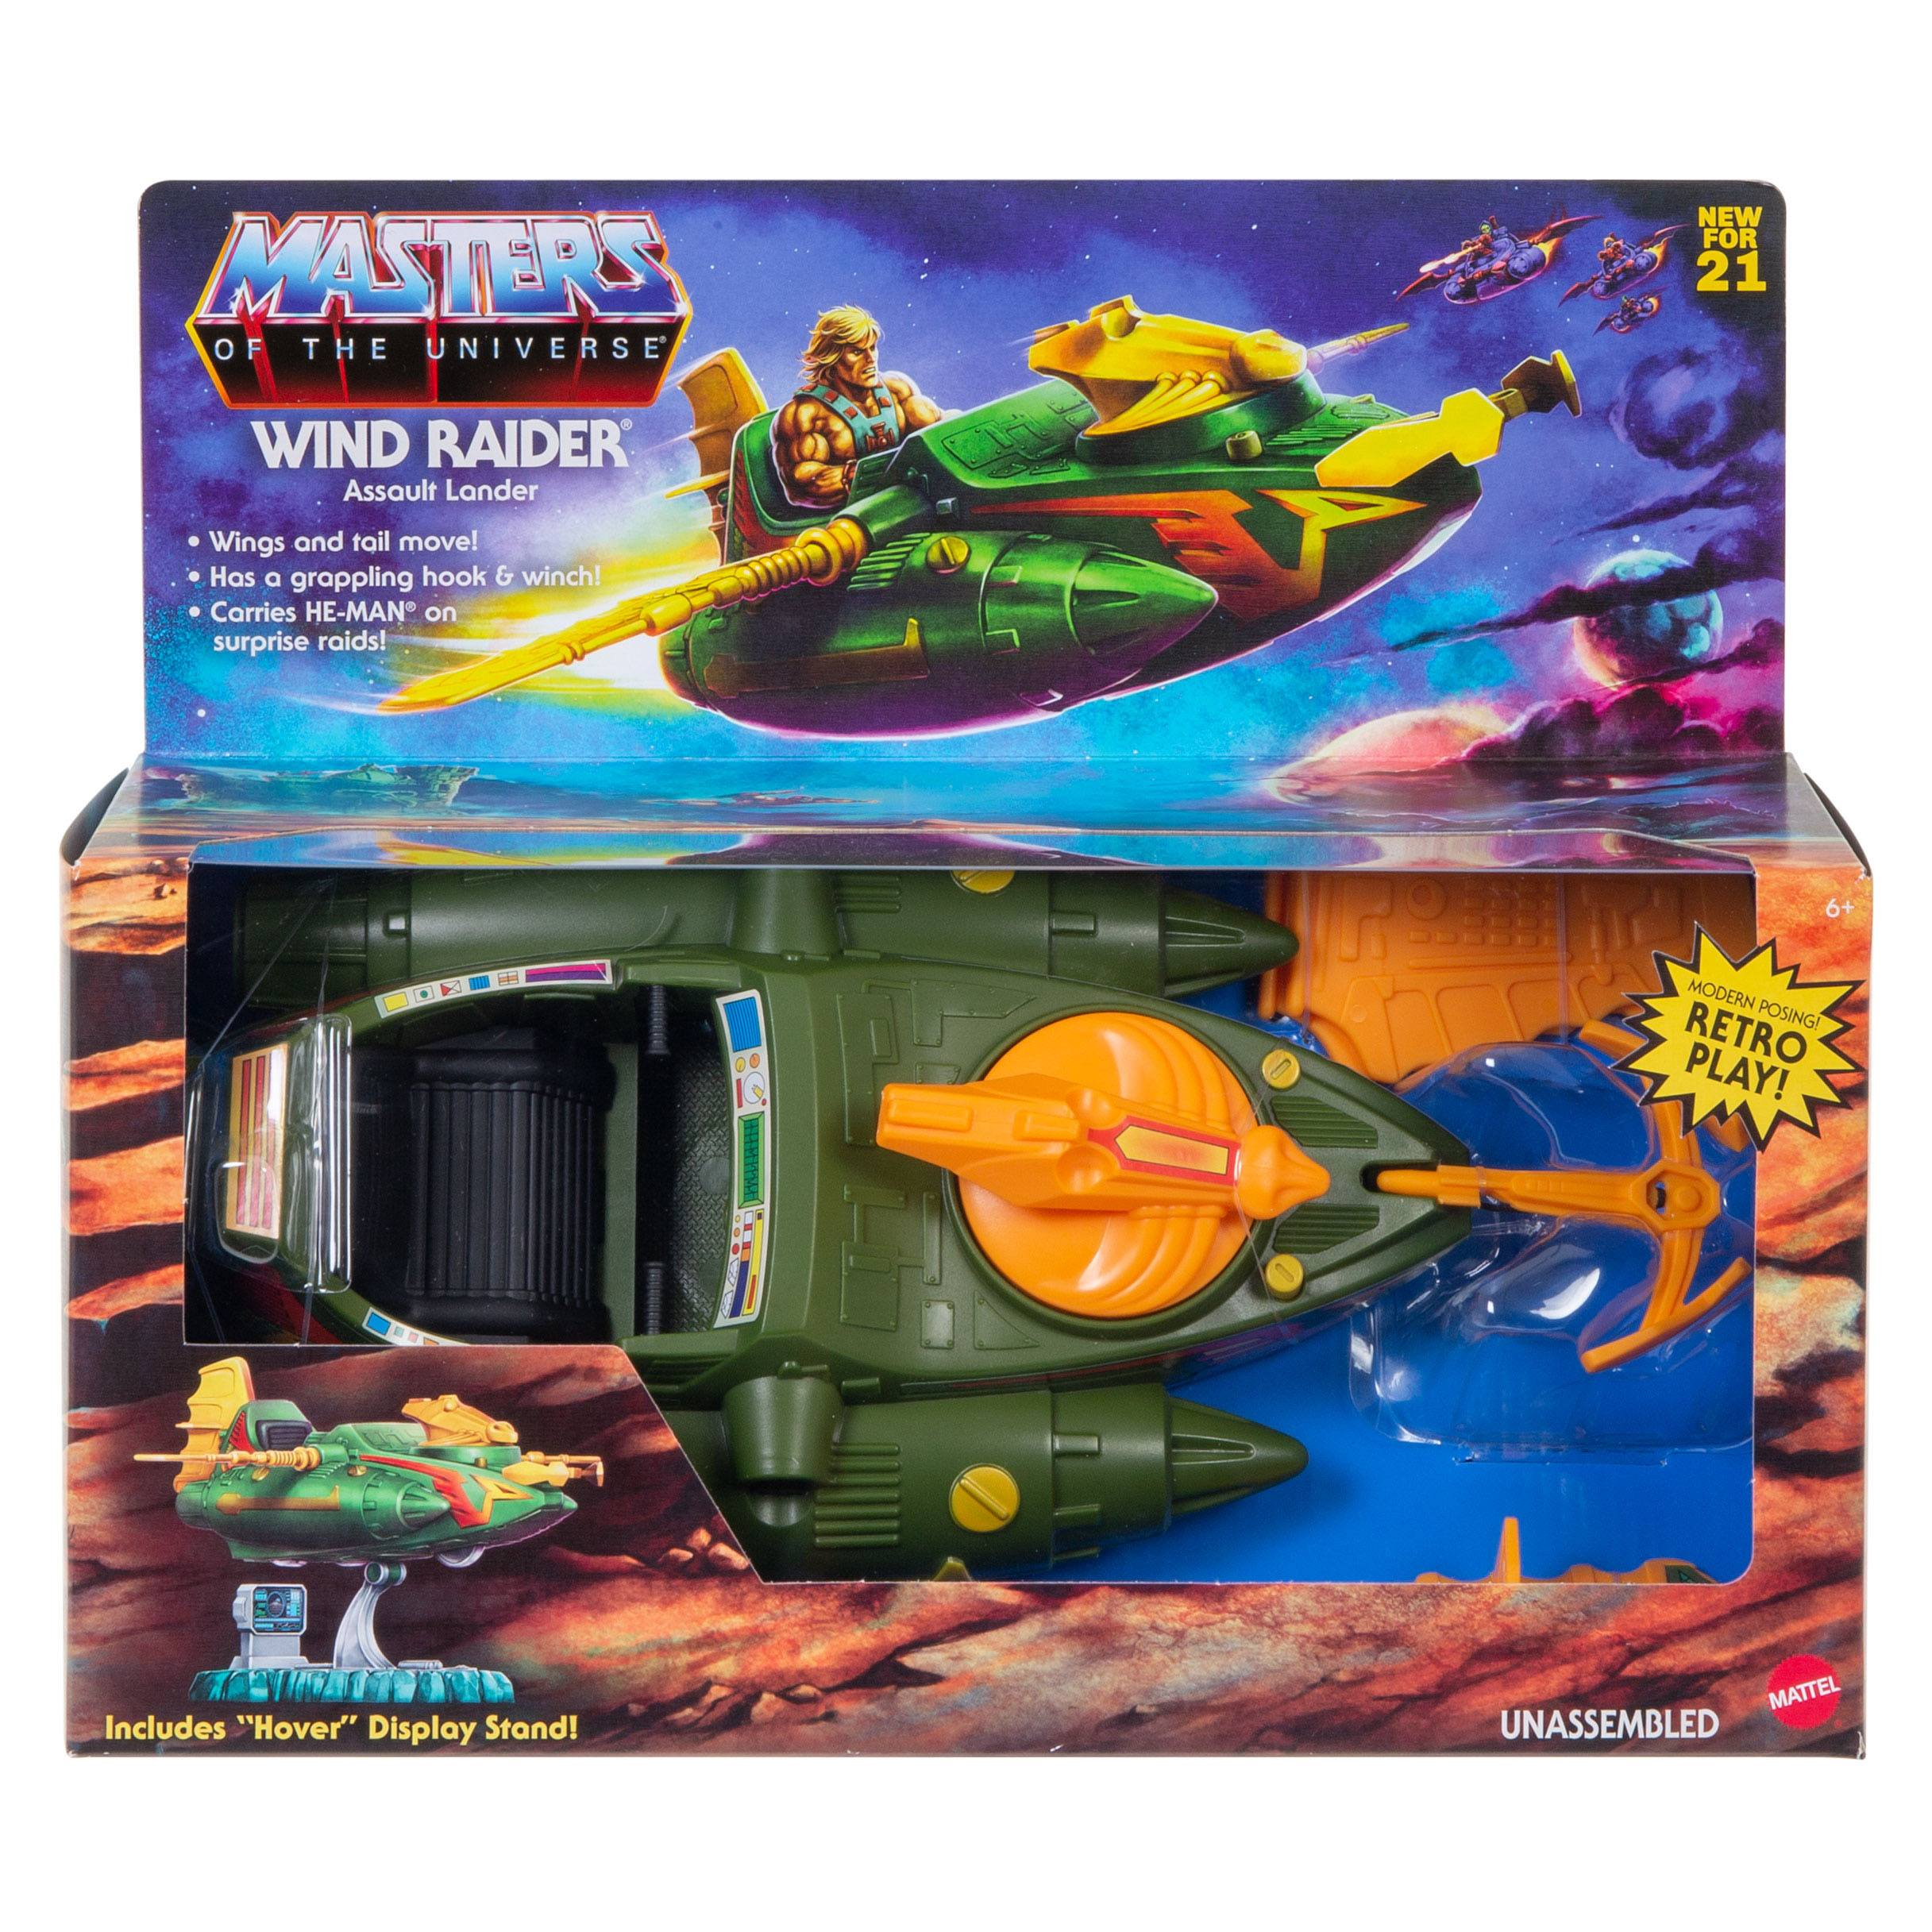 Masters of the Universe Origins Fahrzeug 2021 Wind Raider 32 cm MATTGYY34 0887961982886